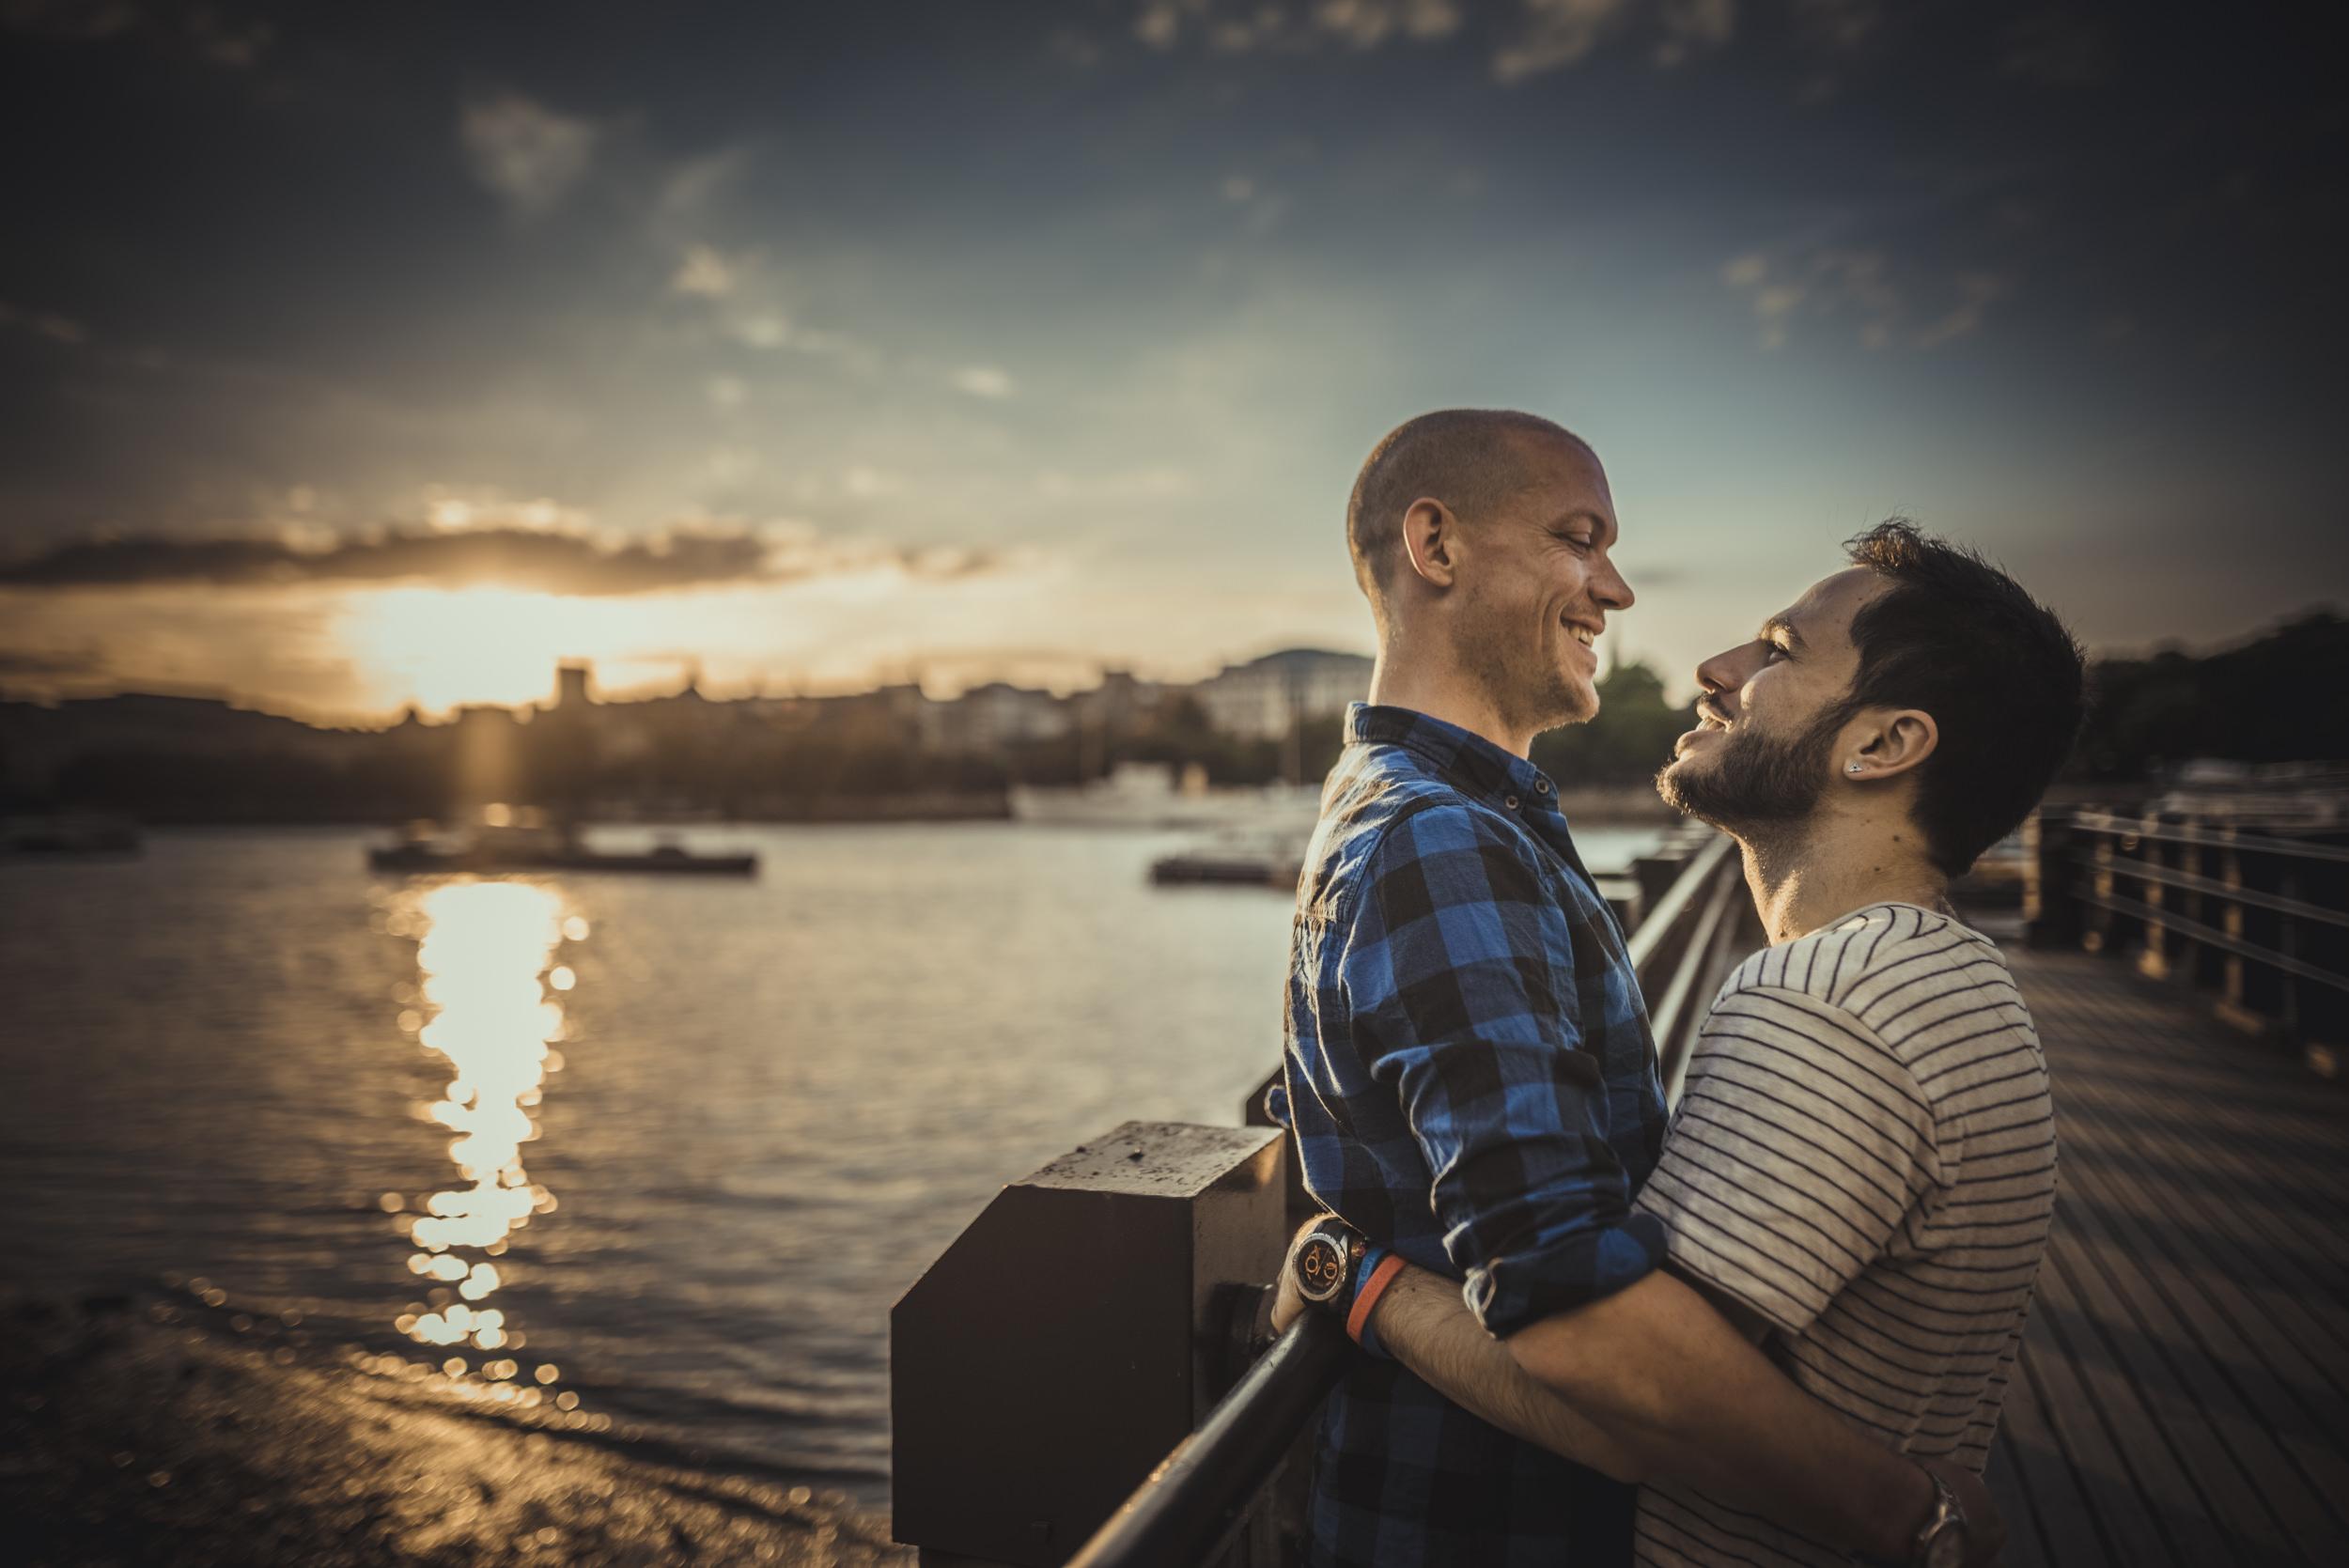 Rhys-and-Alex-engagement-session-london-gay-same-sex-manu-mendoza-wedding-photography-036.jpg